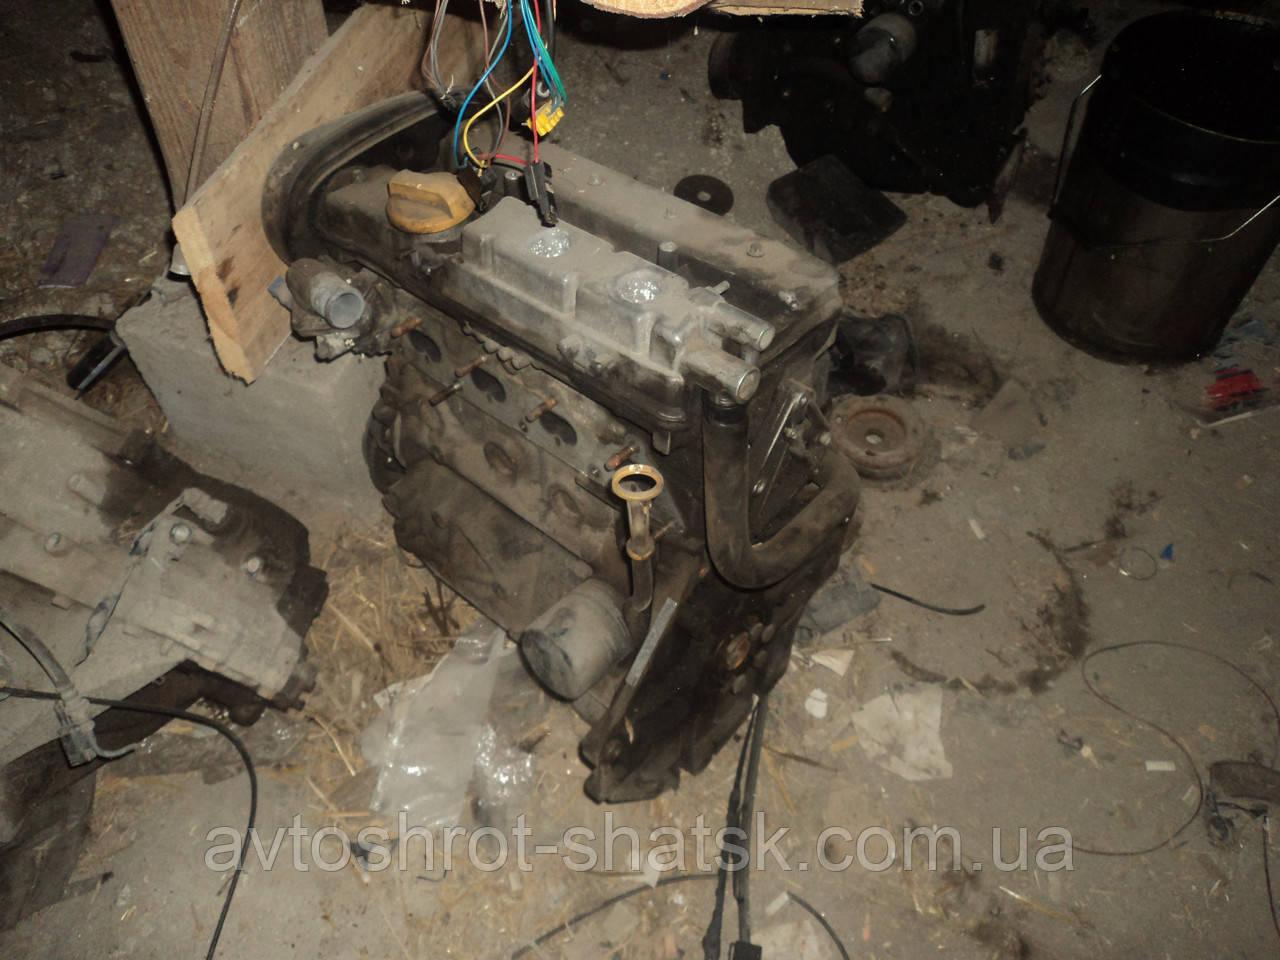 Двигун вектра б 1.6 16в x16xe